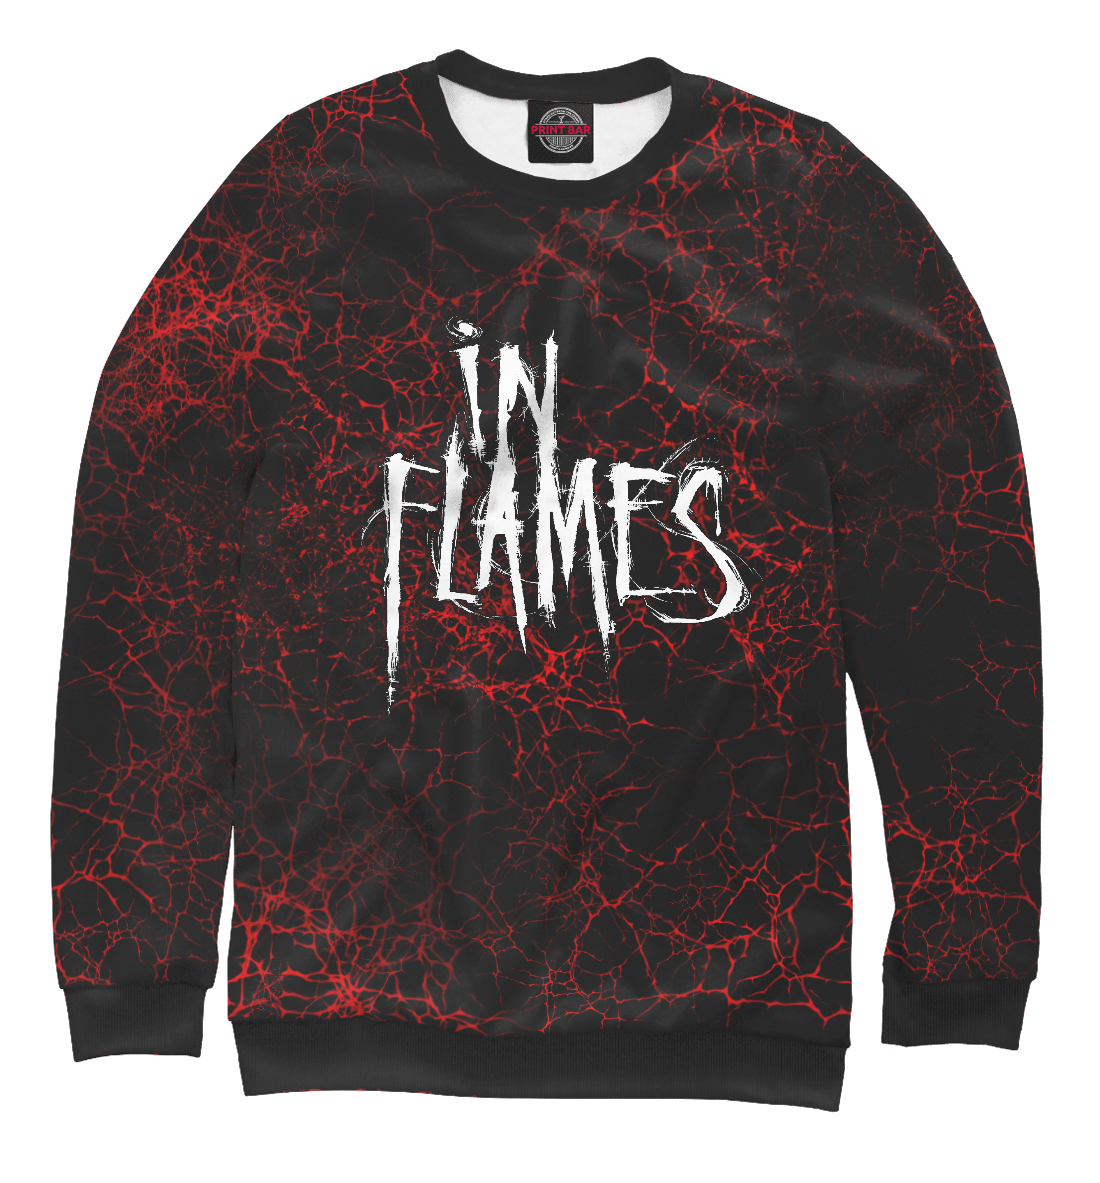 Купить In Flames, Printbar, Свитшоты, INF-302261-swi-1